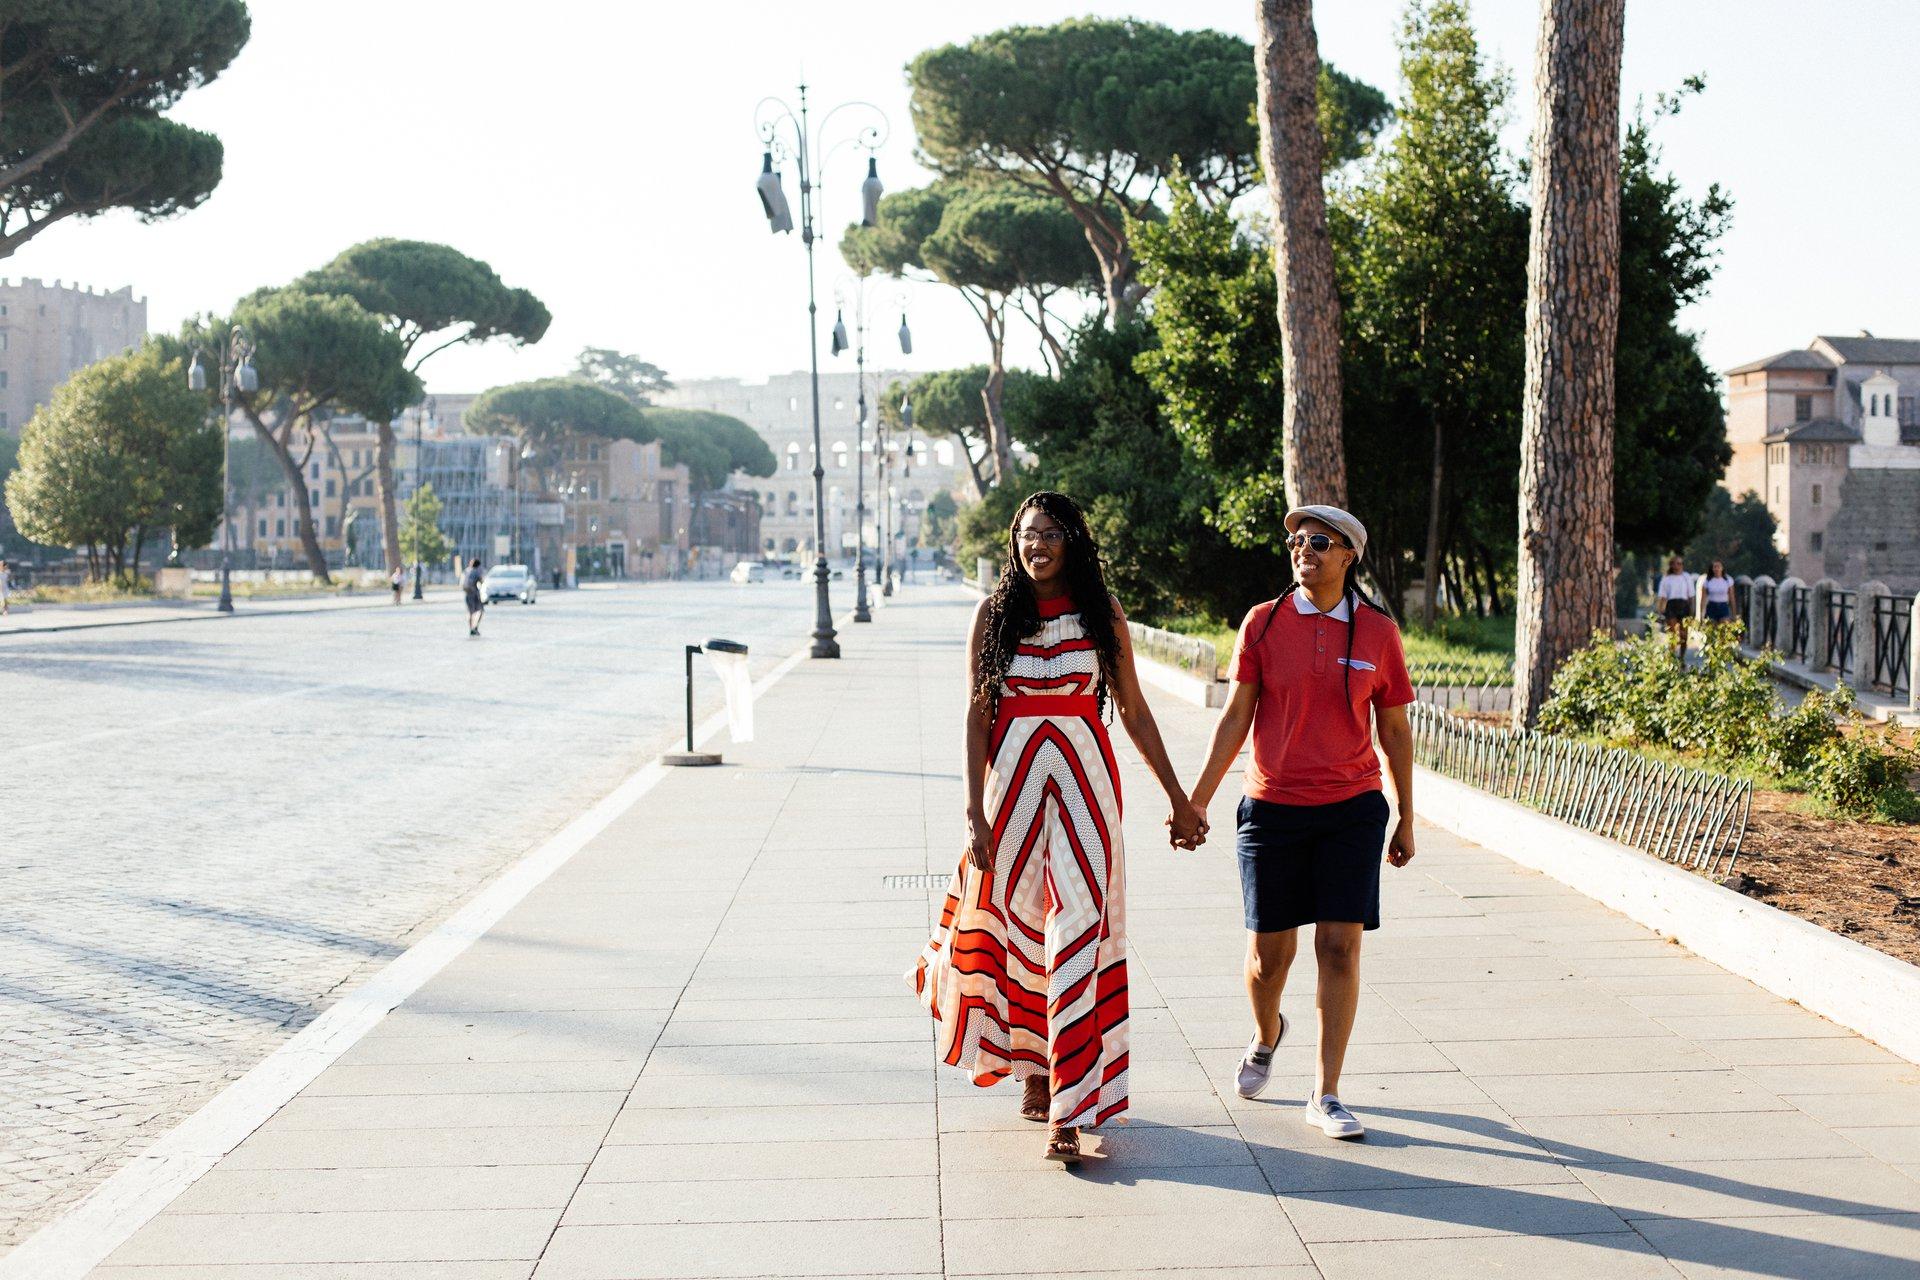 Rome-Italy-travel-story-Flytographer-18